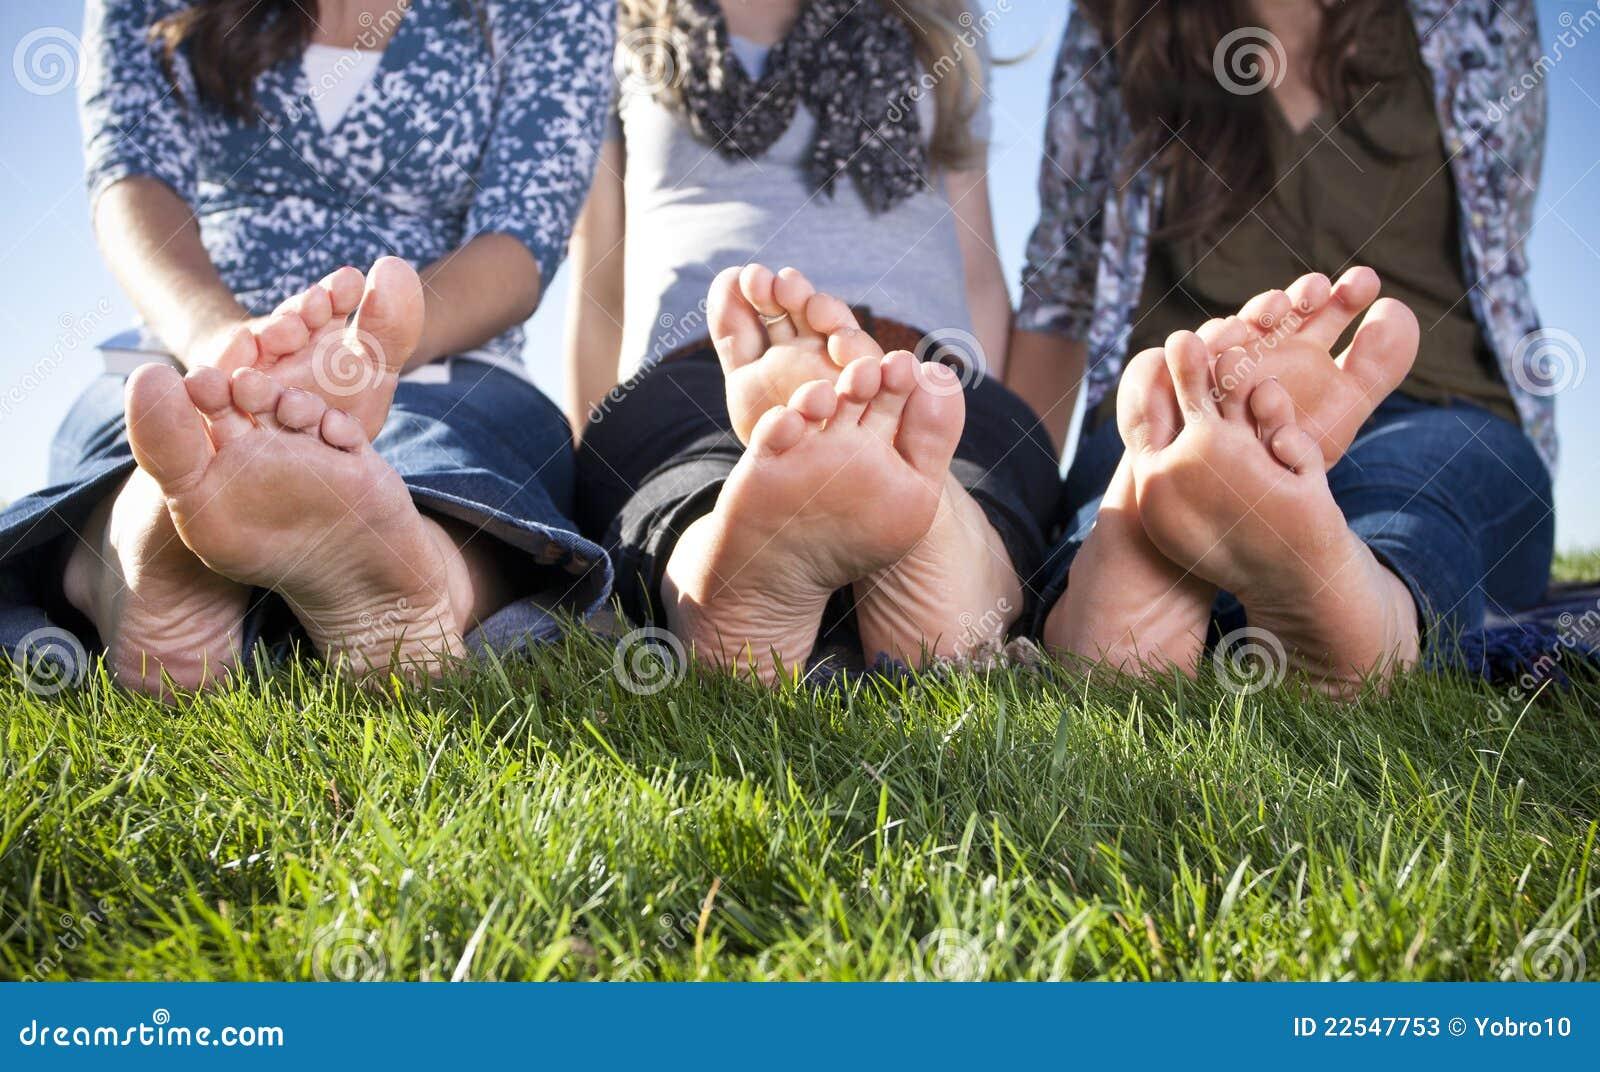 Fotos de Pies descalzos de stock, imgenes de Pies